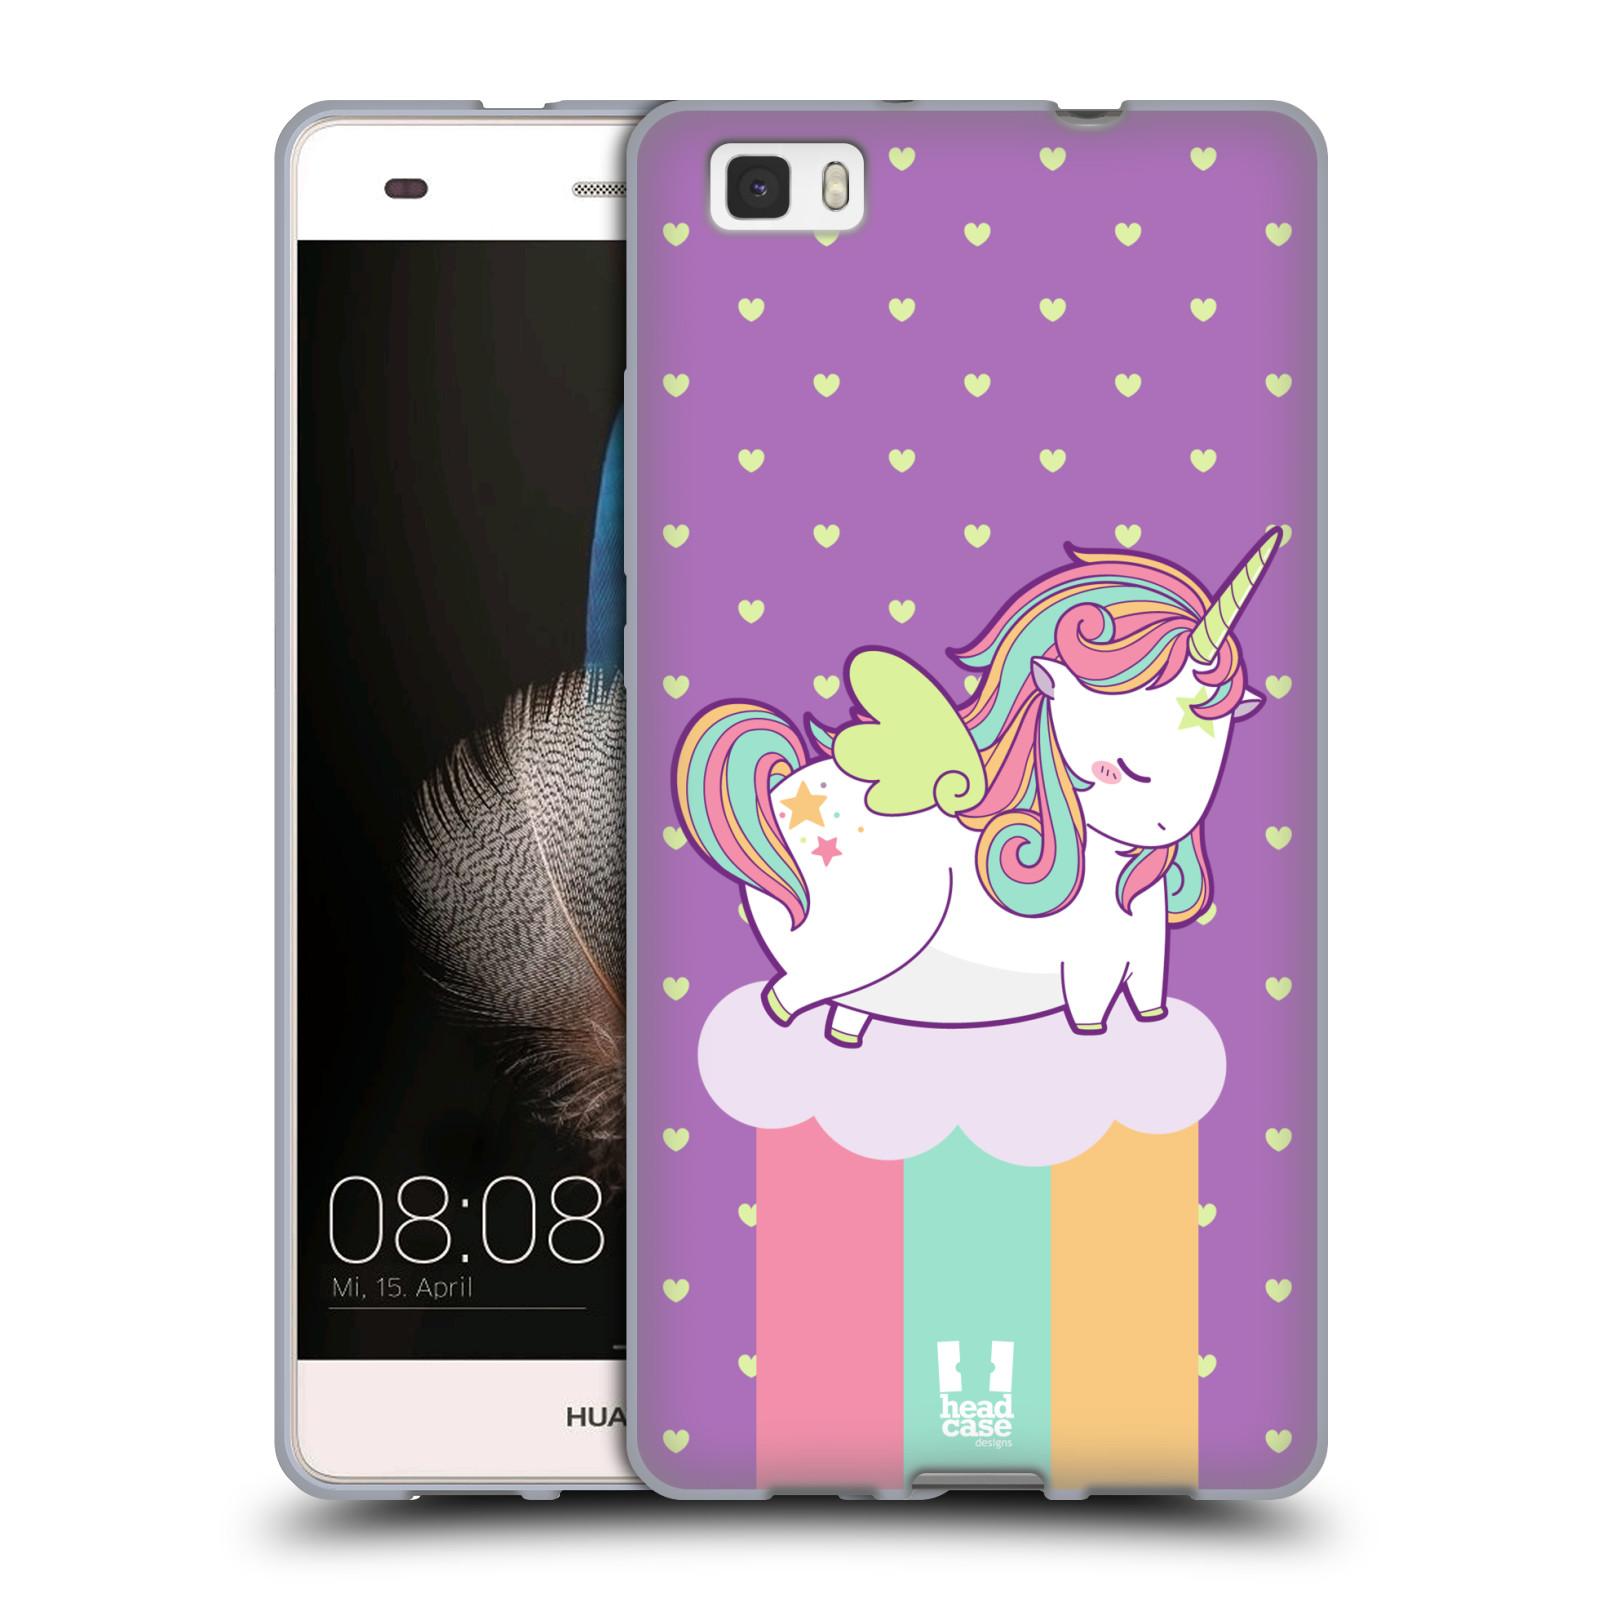 custodia huawei p8 lite unicorno